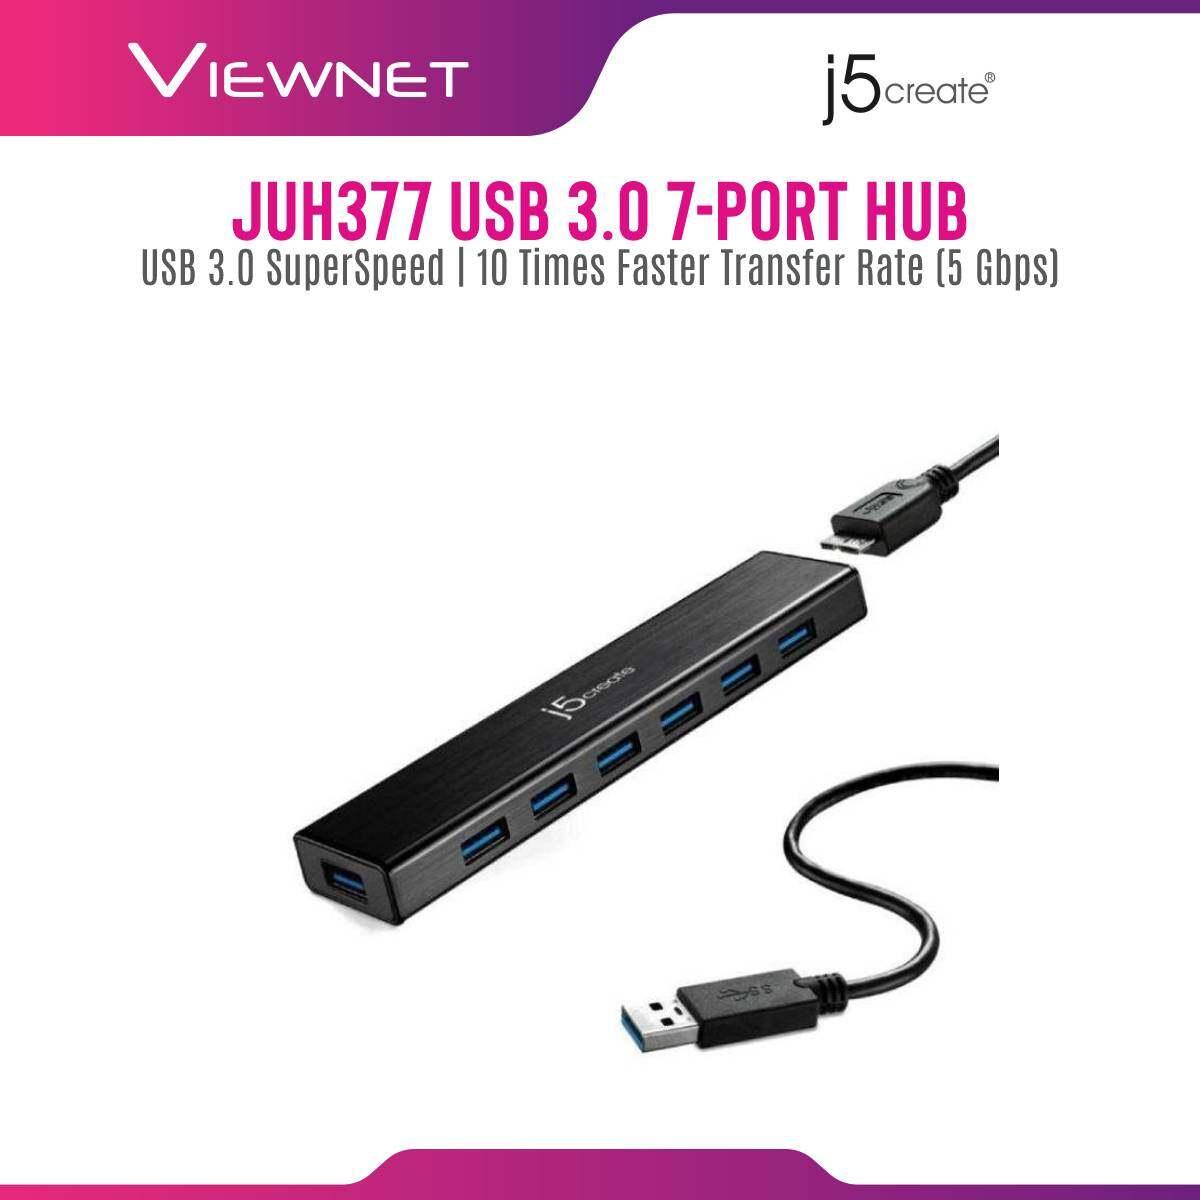 J5 Create JUH377-10 7-Port USB 3.0 With Type-C & Power Adapter USB Hub